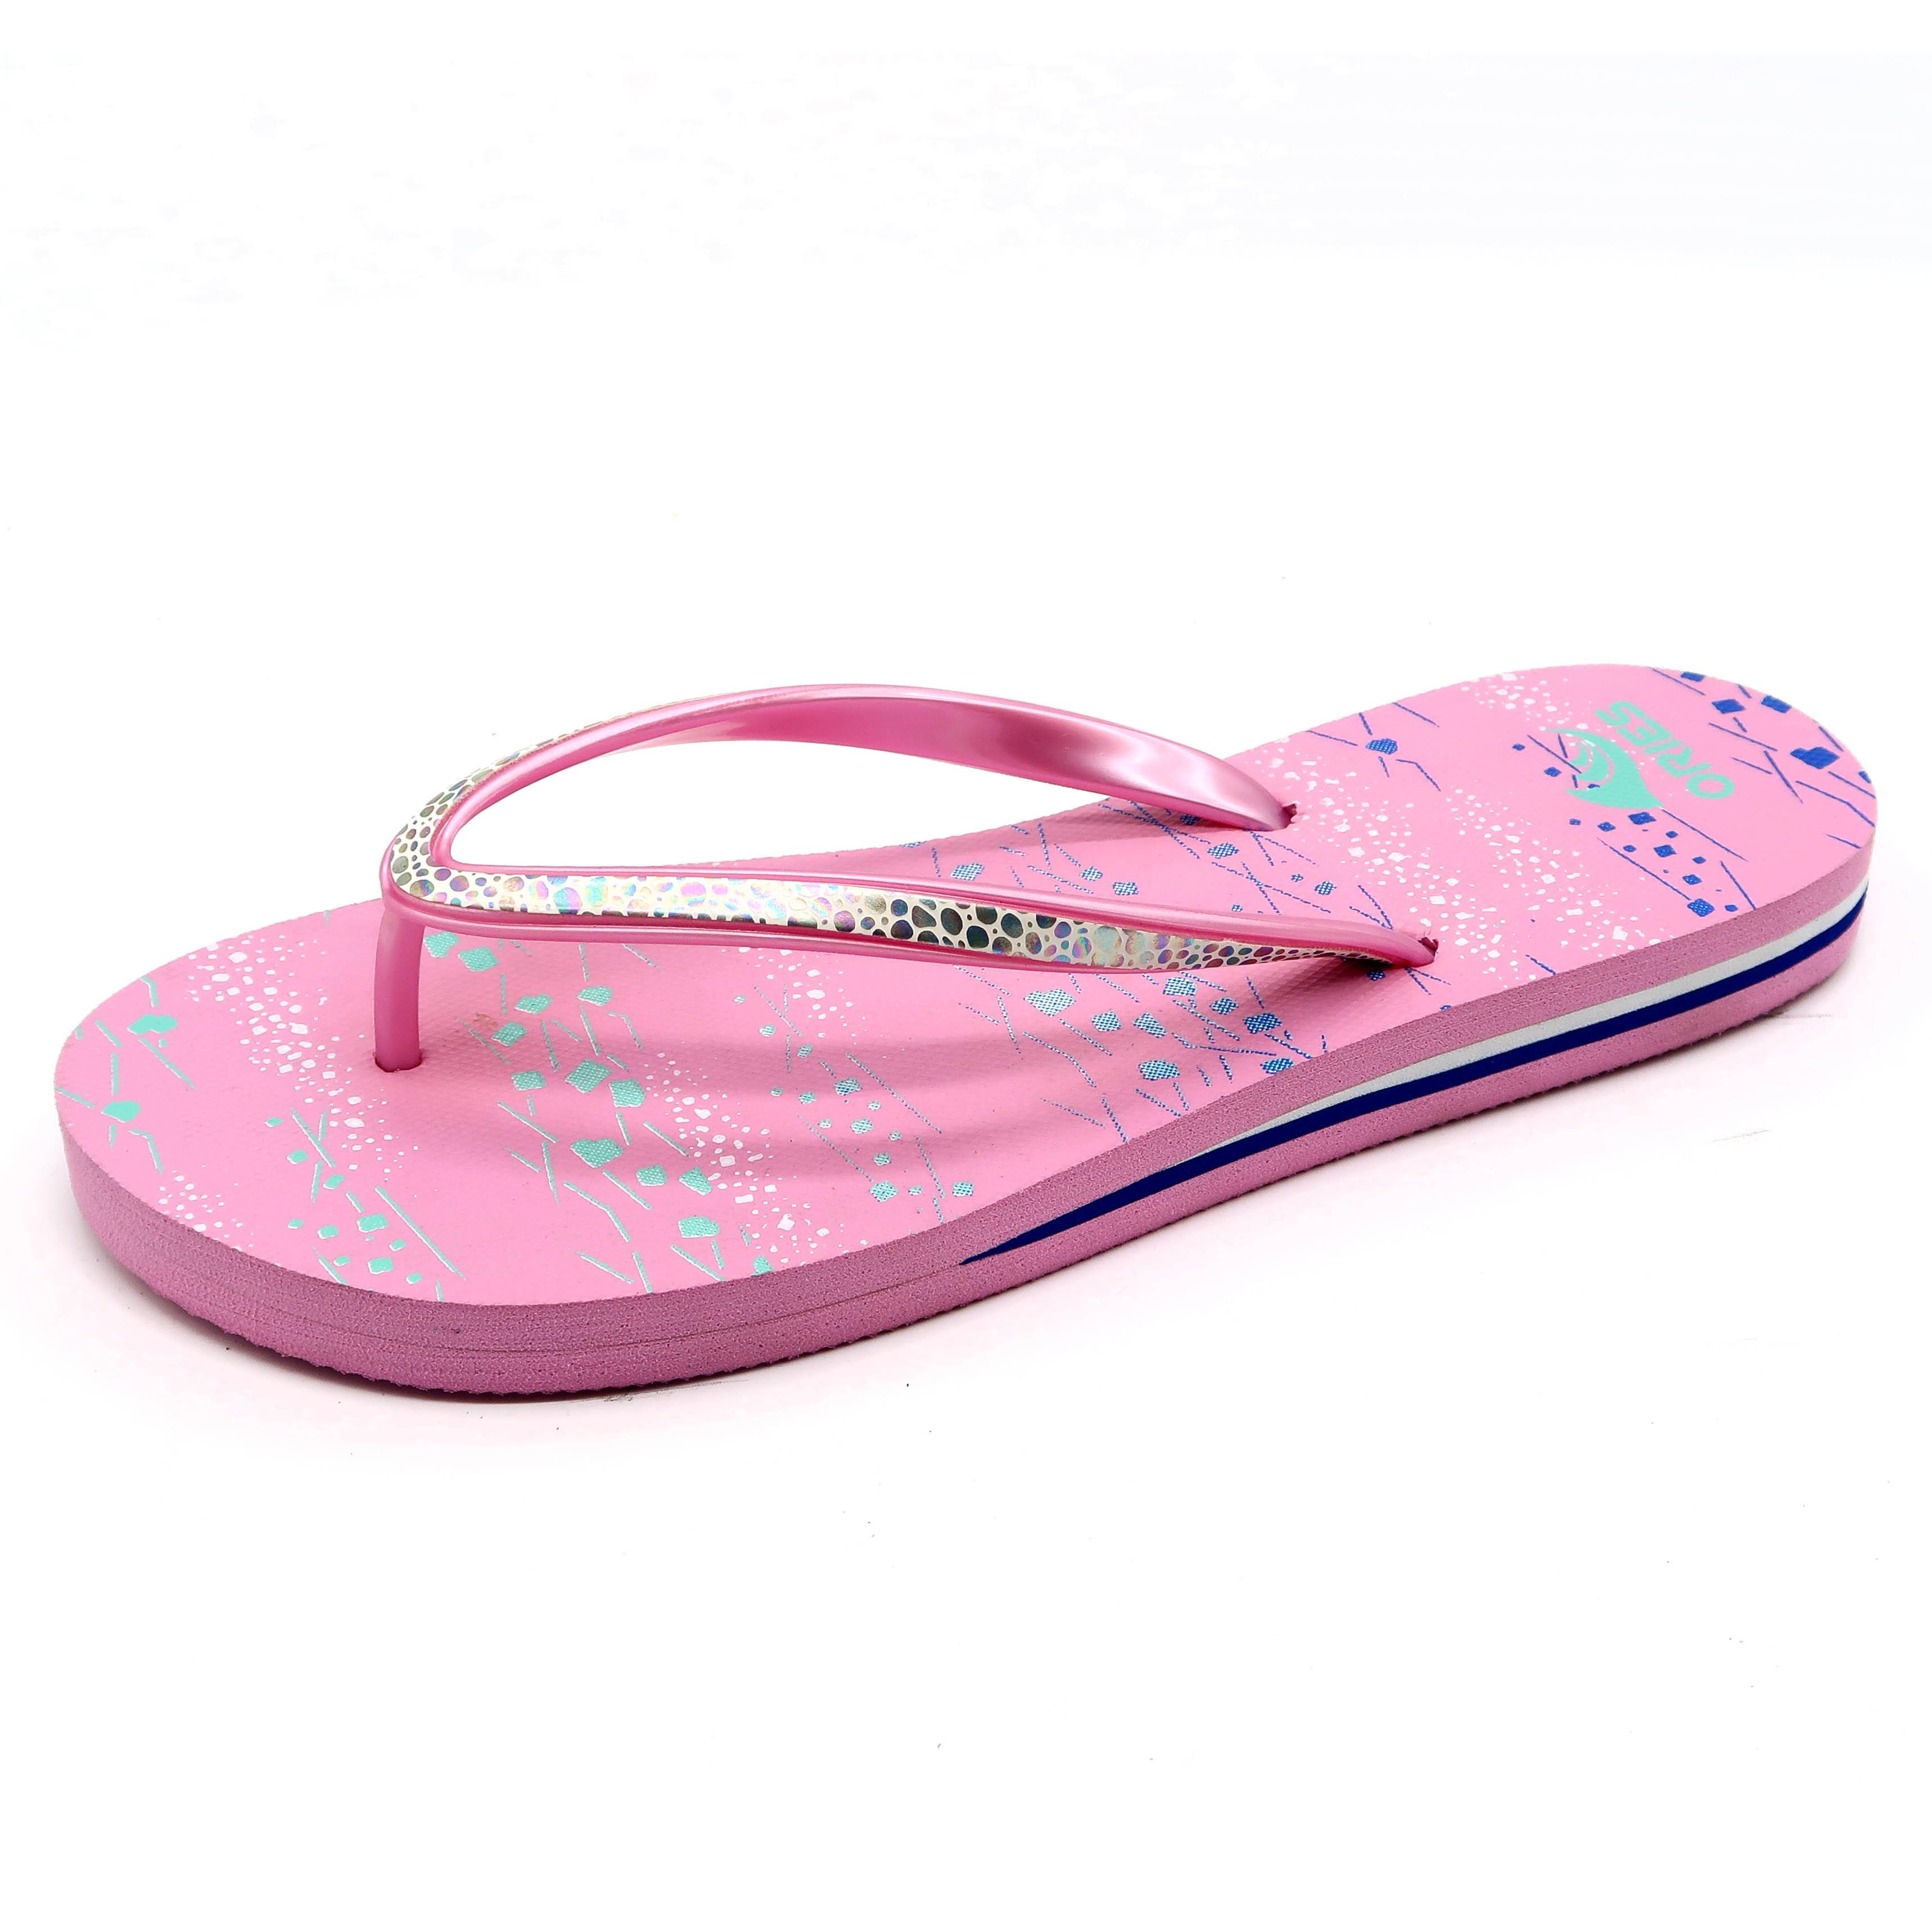 98234abf1d8a China Flip Flop Pink